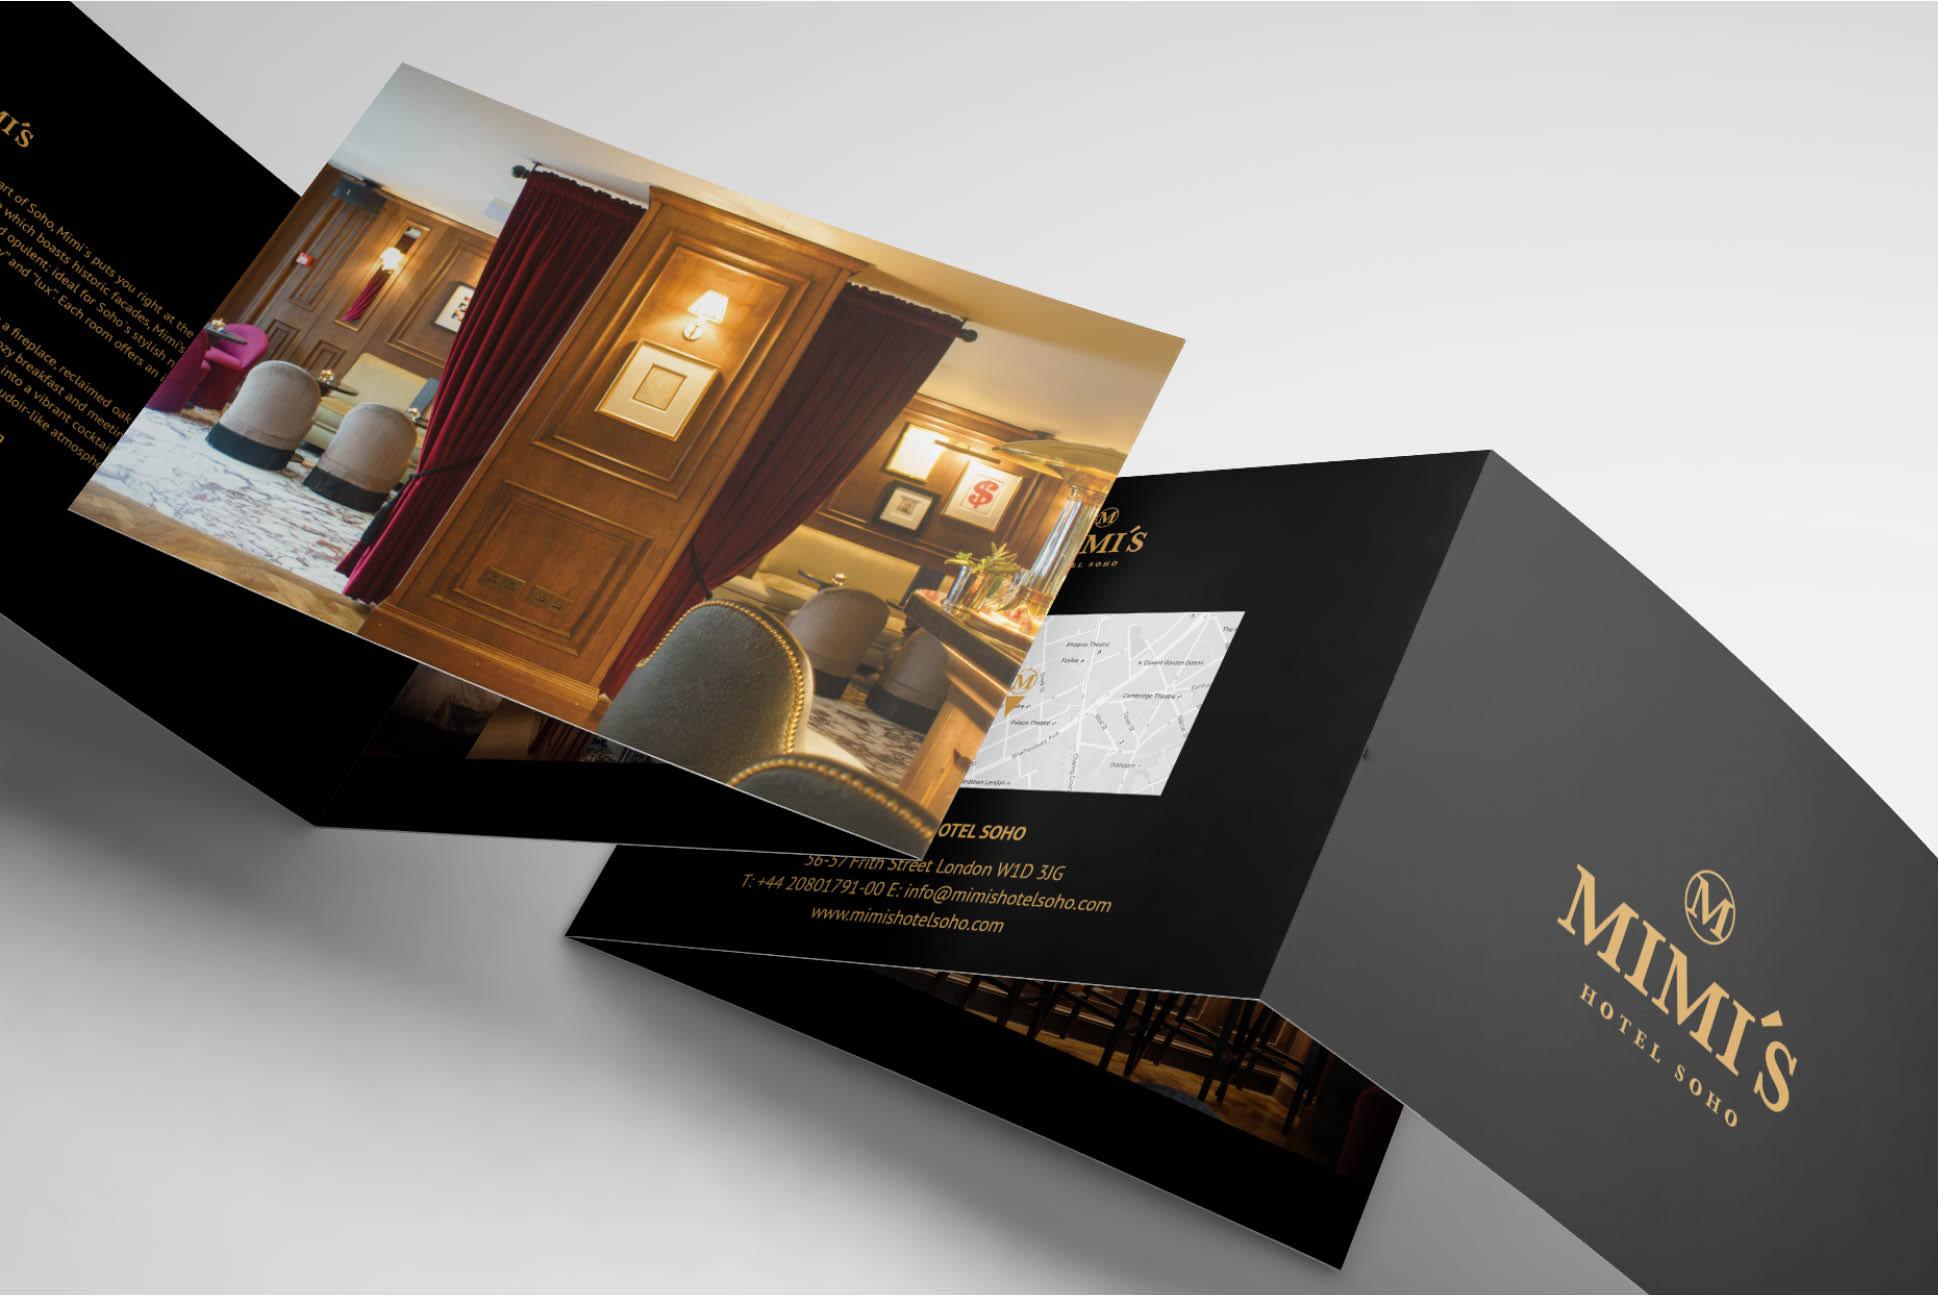 Mimi's Hotel Soho brochure     Independent Marketing - IM London   Hospitality and Hotel Branding